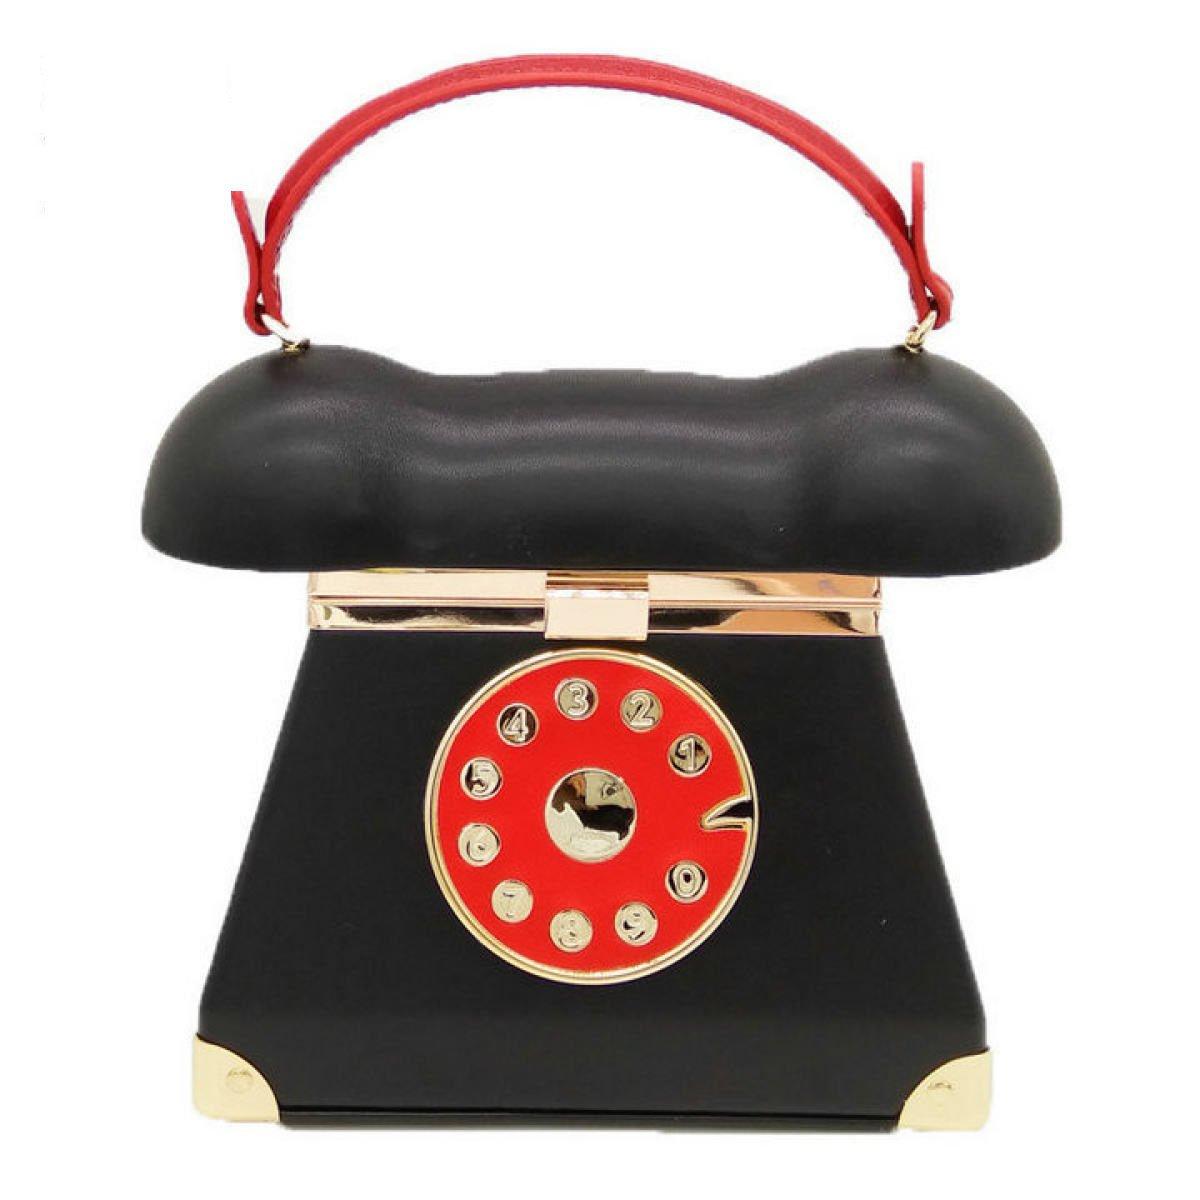 Fashion Trend Dinner Bag New Handbag Telephone Modeling Messenger Bag Retro Wild Mickey Bag, Red-OneSize Rain where bags